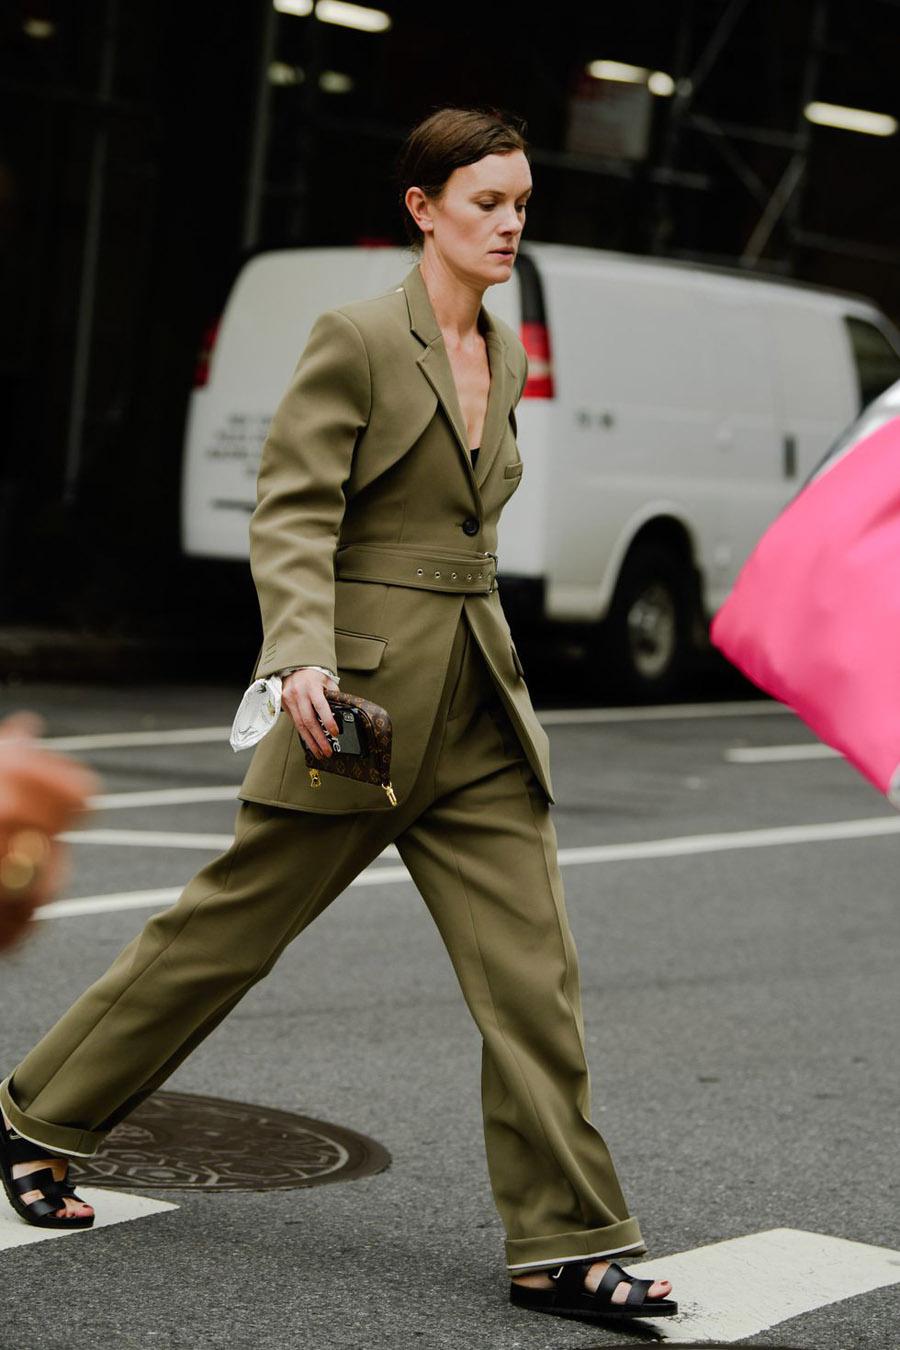 nyc-fashion-week-street-style-nyfw-ss20-tyler-joe-day-4-cos-051-1568296651